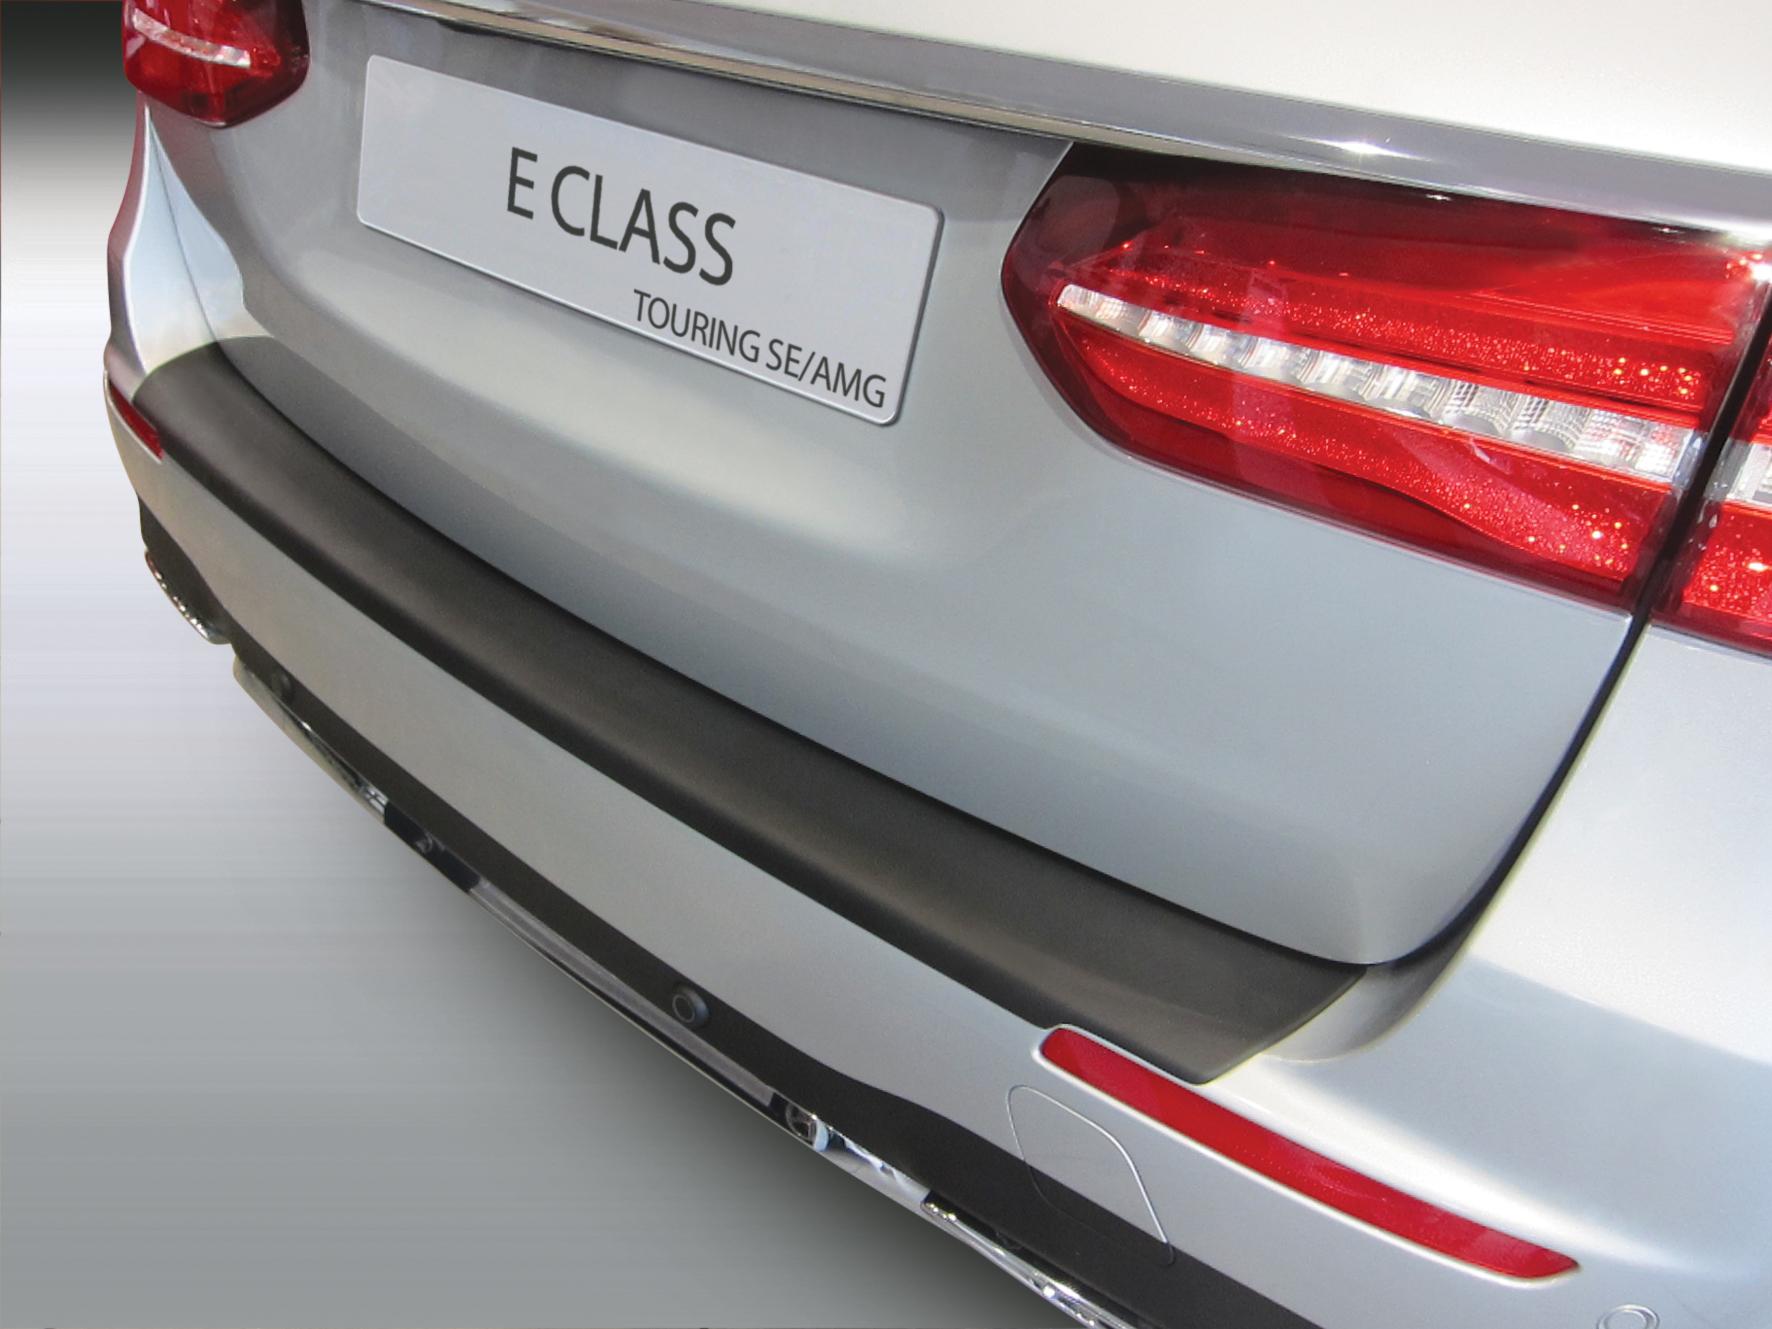 OPPL Ladekantenschutz für Mercedes E-Klasse T-Modell S213 Kombi 2016